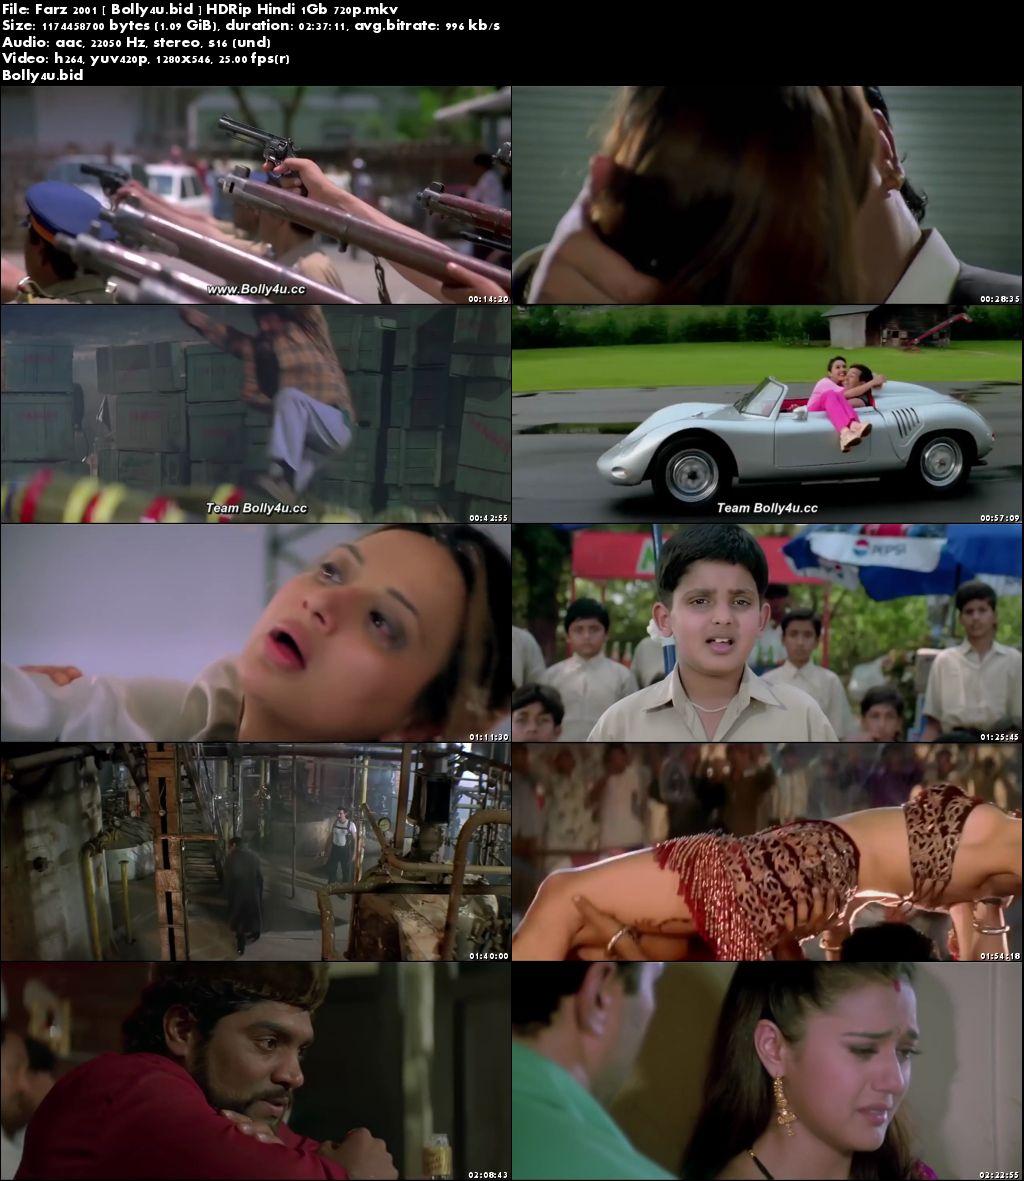 Farz 2001 HDRip 450MB Full Hindi Movie Download 480p